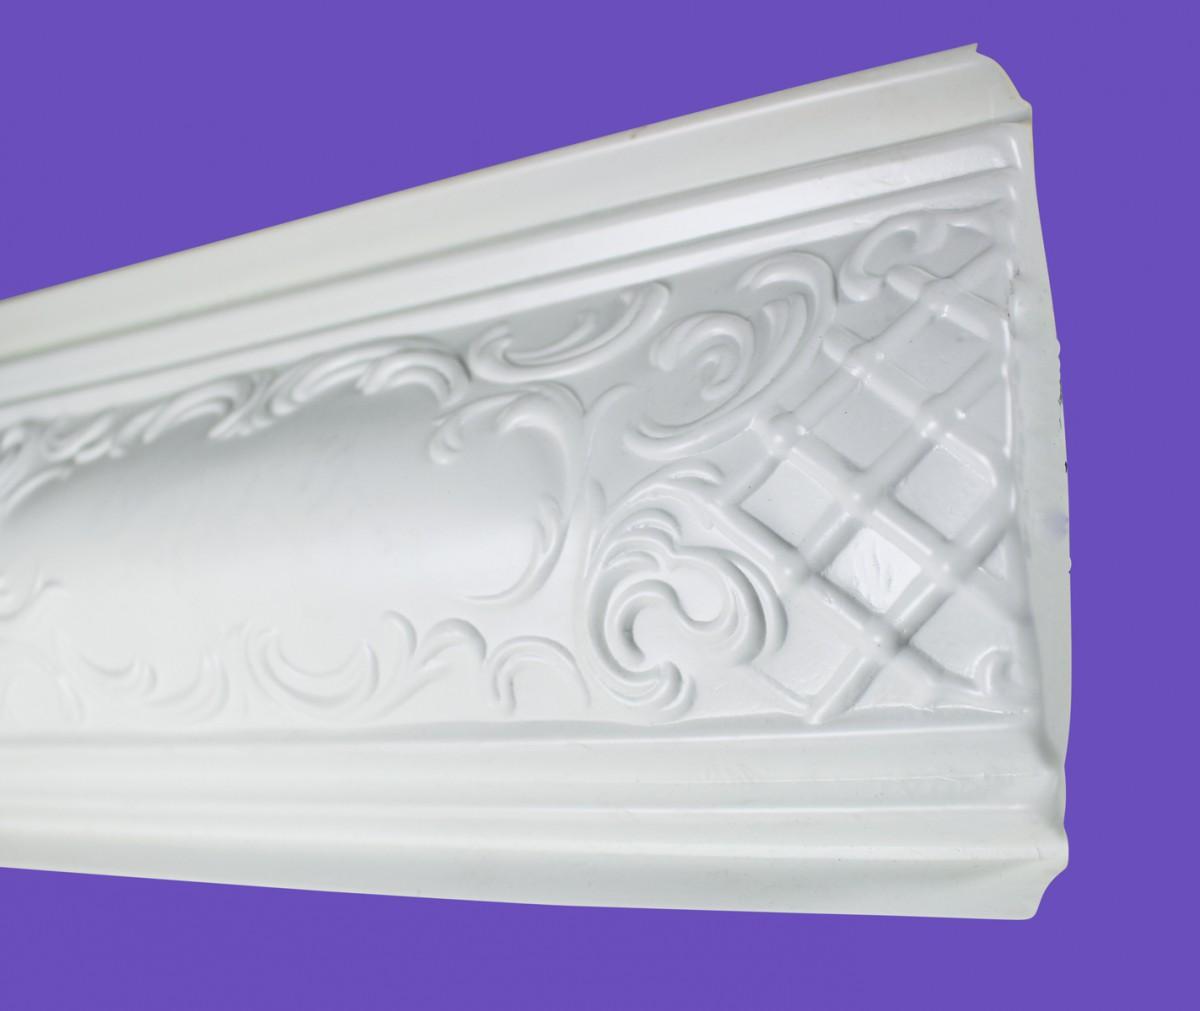 Cornice White Urethane Sample of 19969 Cornice Cornice Moulding Cornice Molding